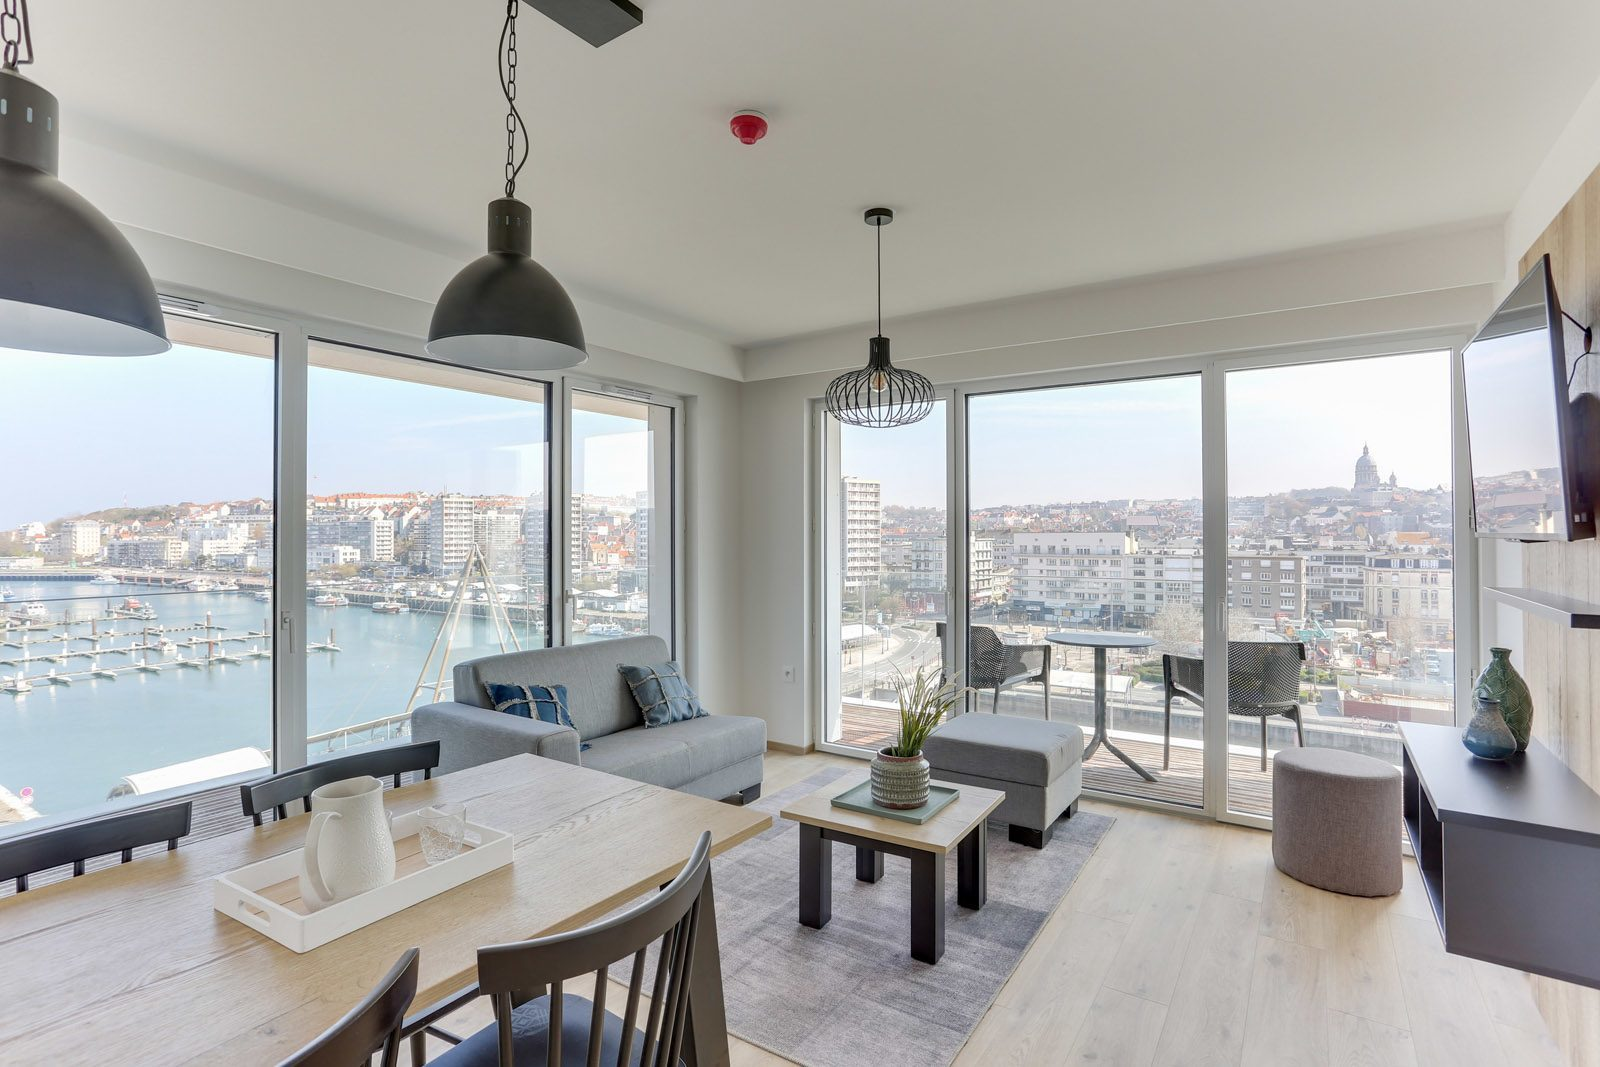 Vakantieappartement in Boulogne-sur-Mer